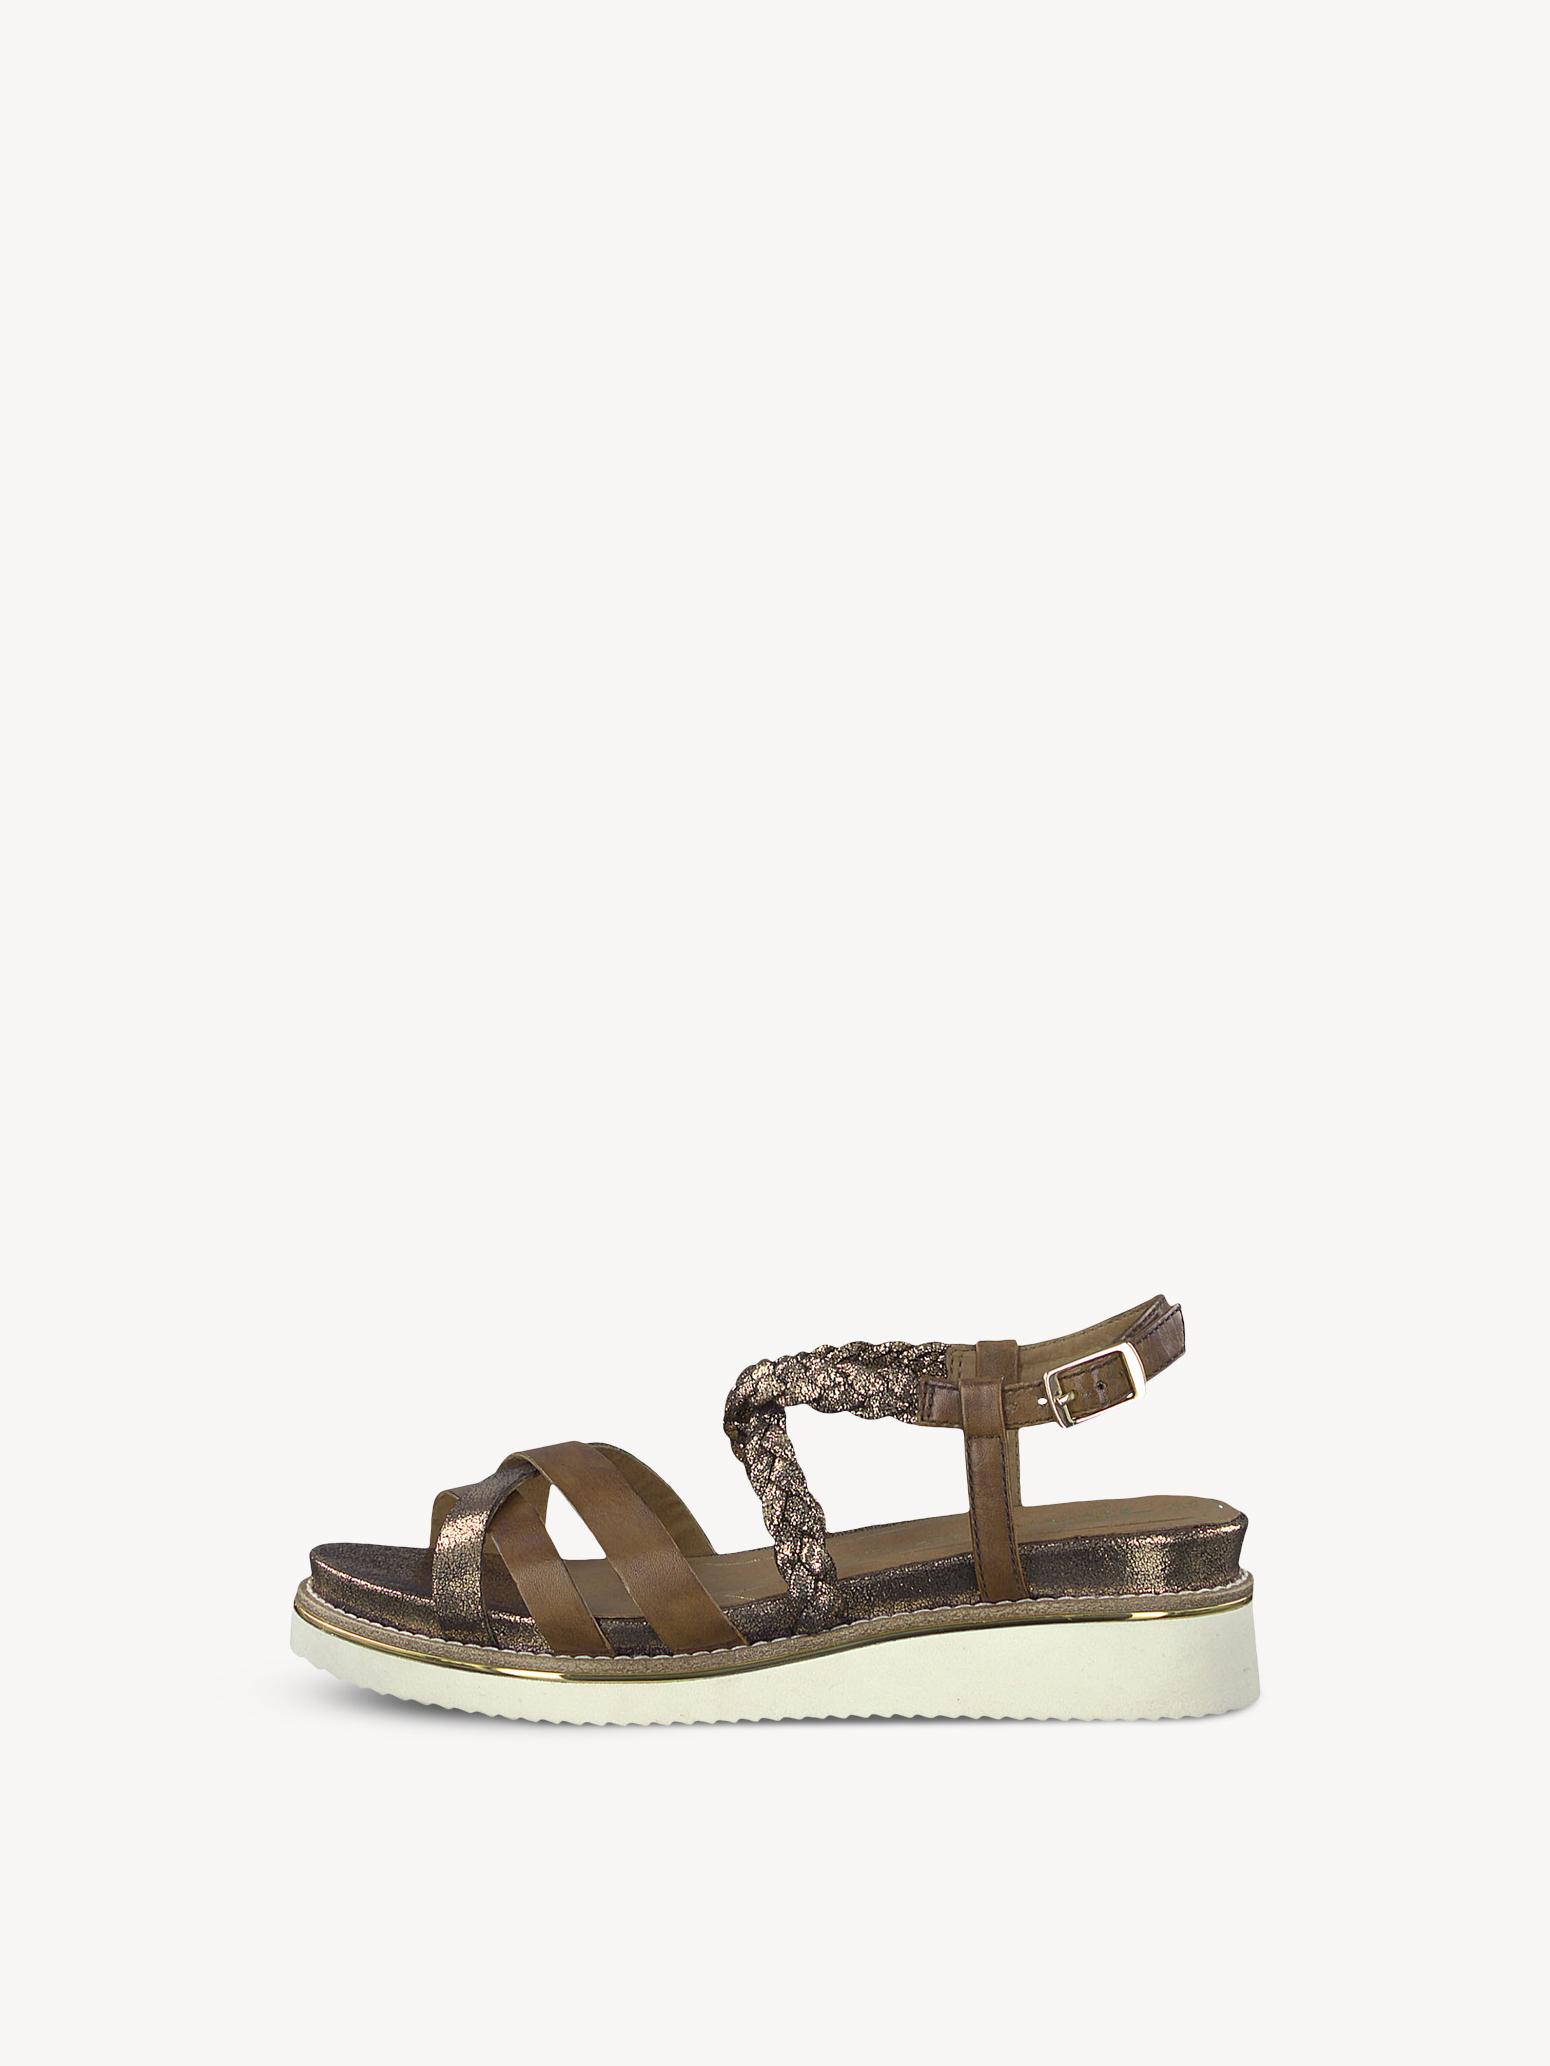 Tamaris Sandale schwarz Leder 38